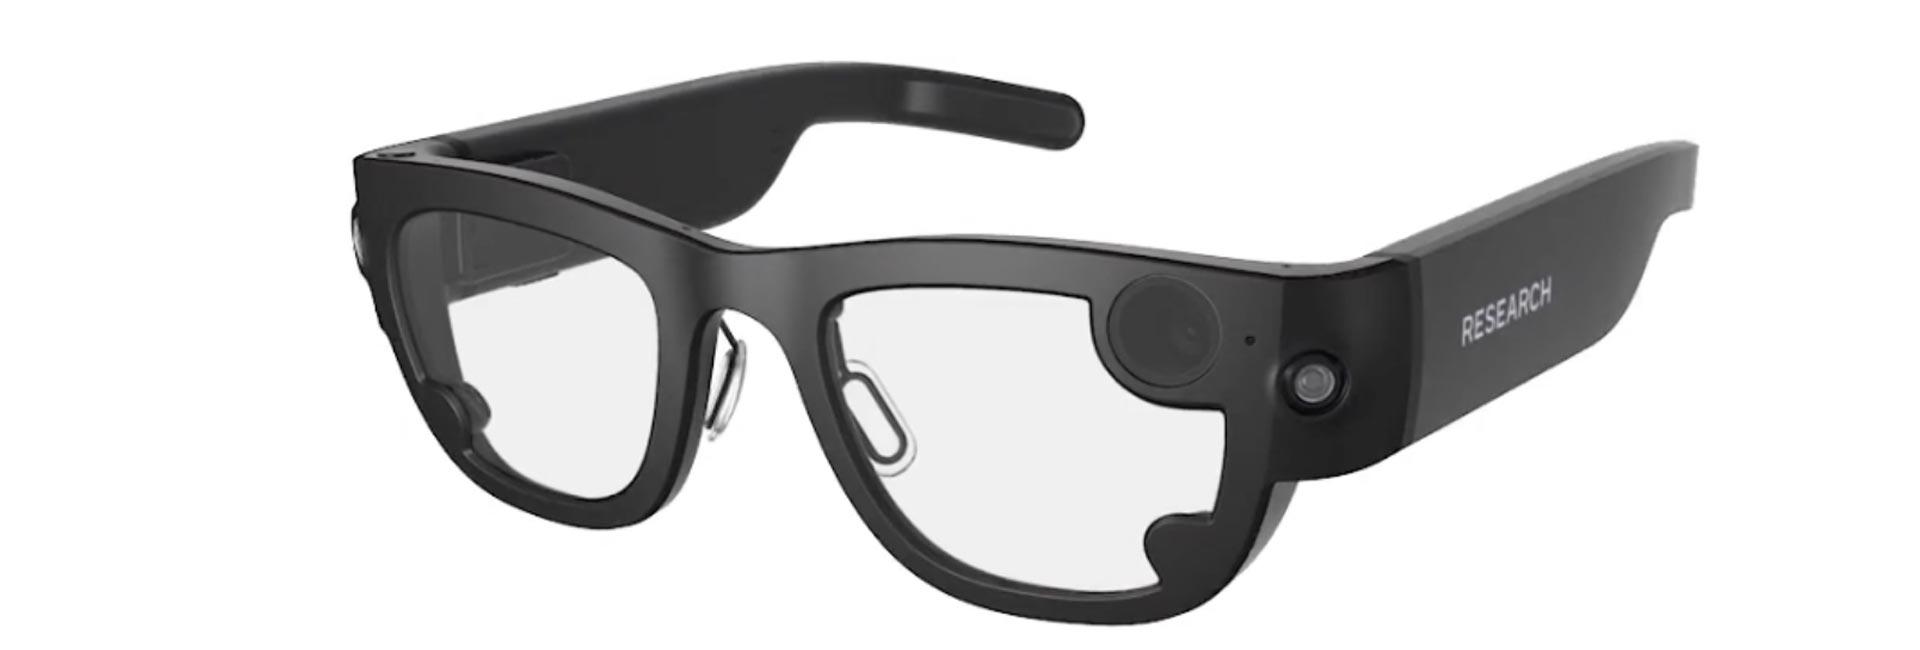 project aria facebook occhiali